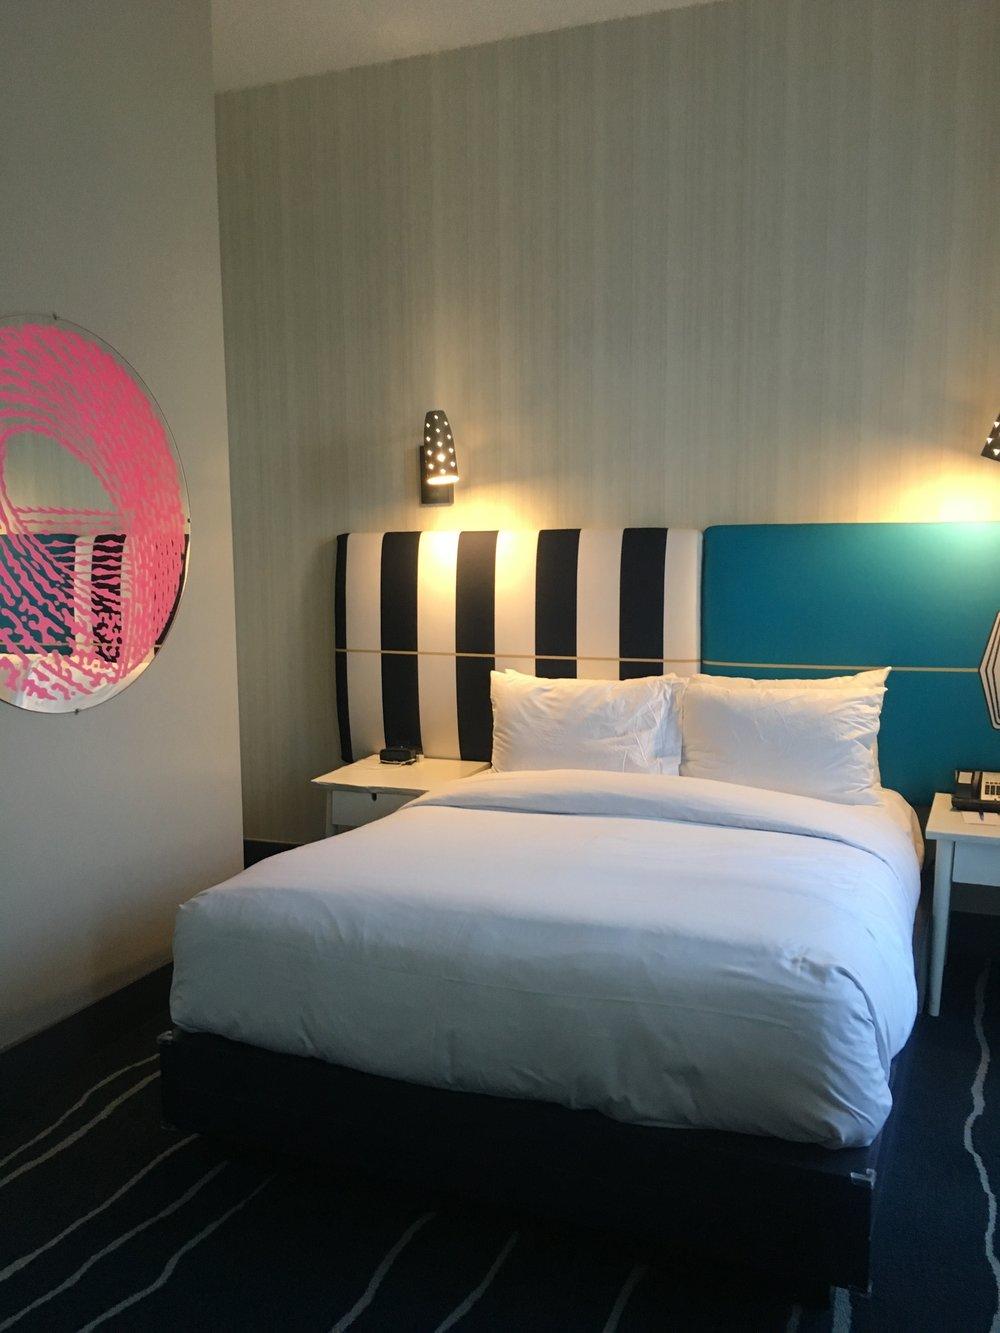 Shorebreak Hotel room